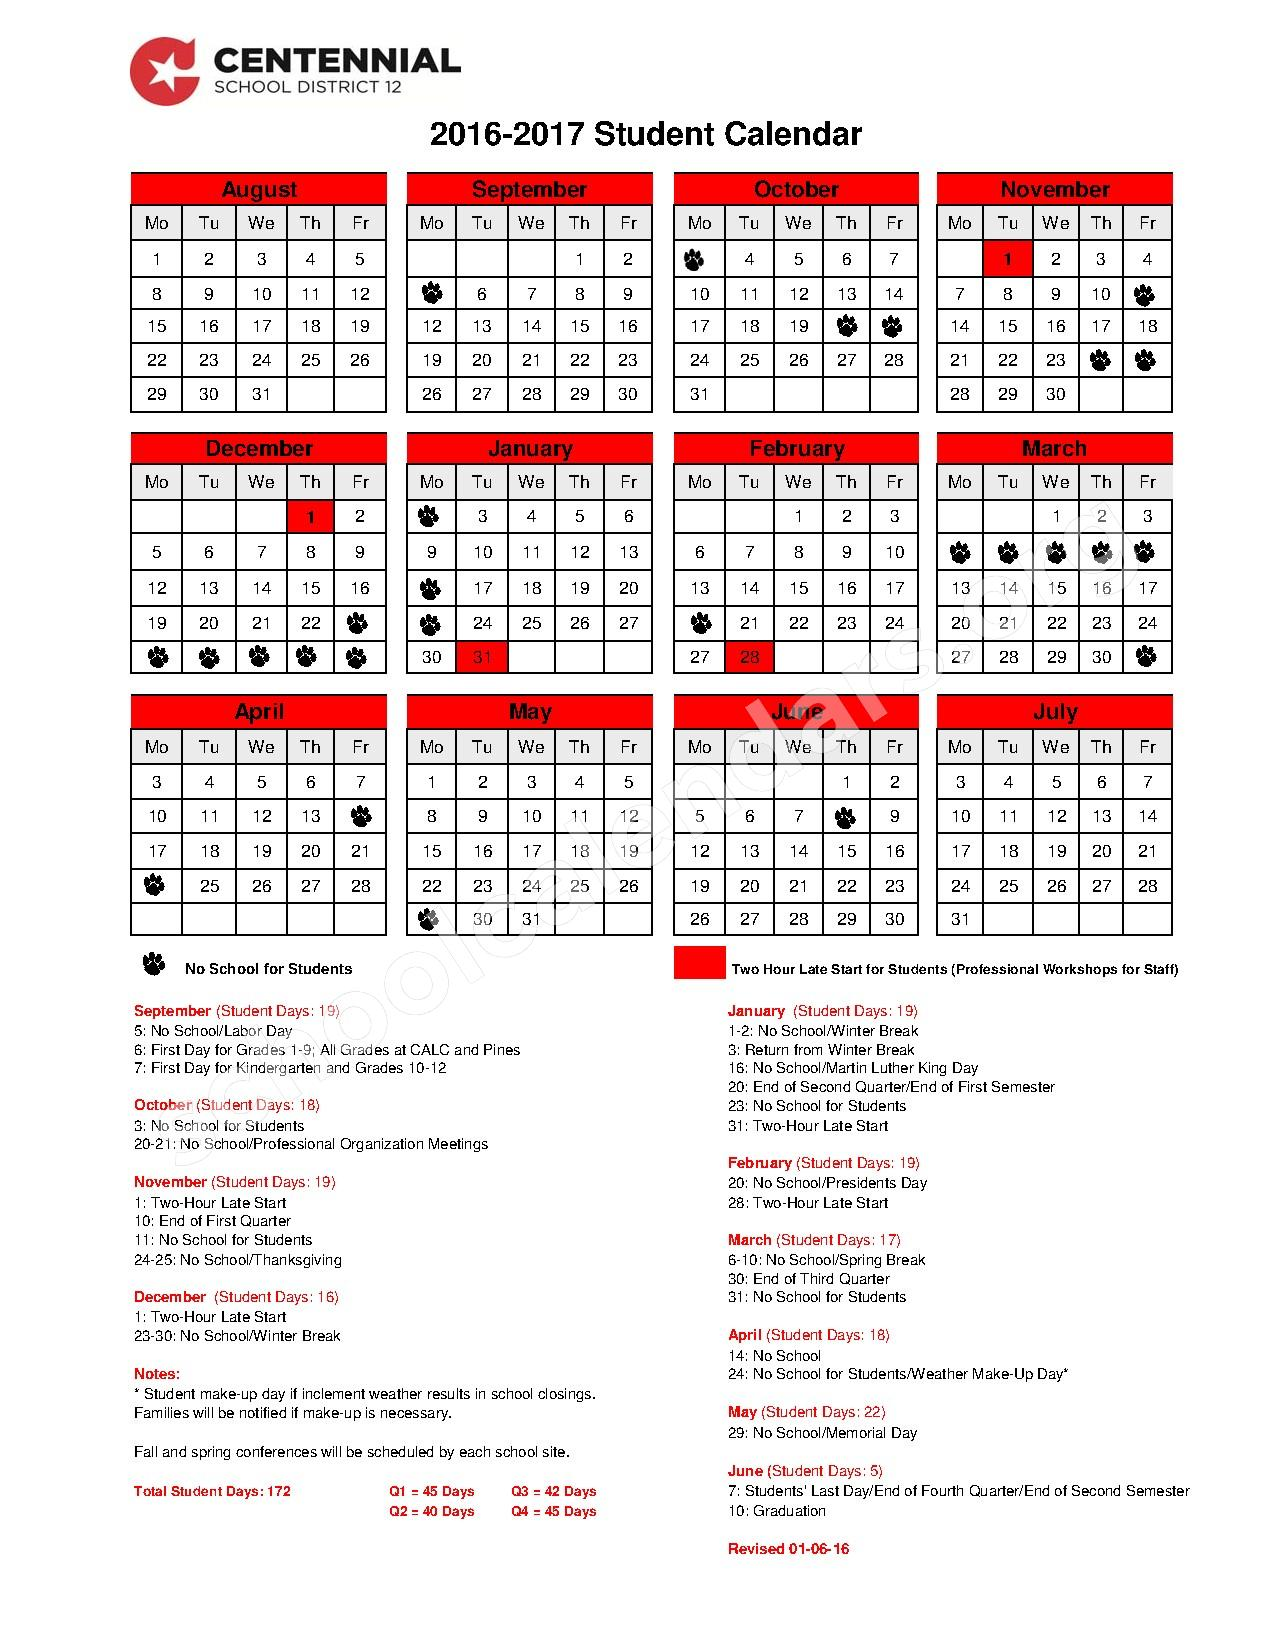 2016 - 2017 Student Calendar – Centennial Area Learning Center – page 1